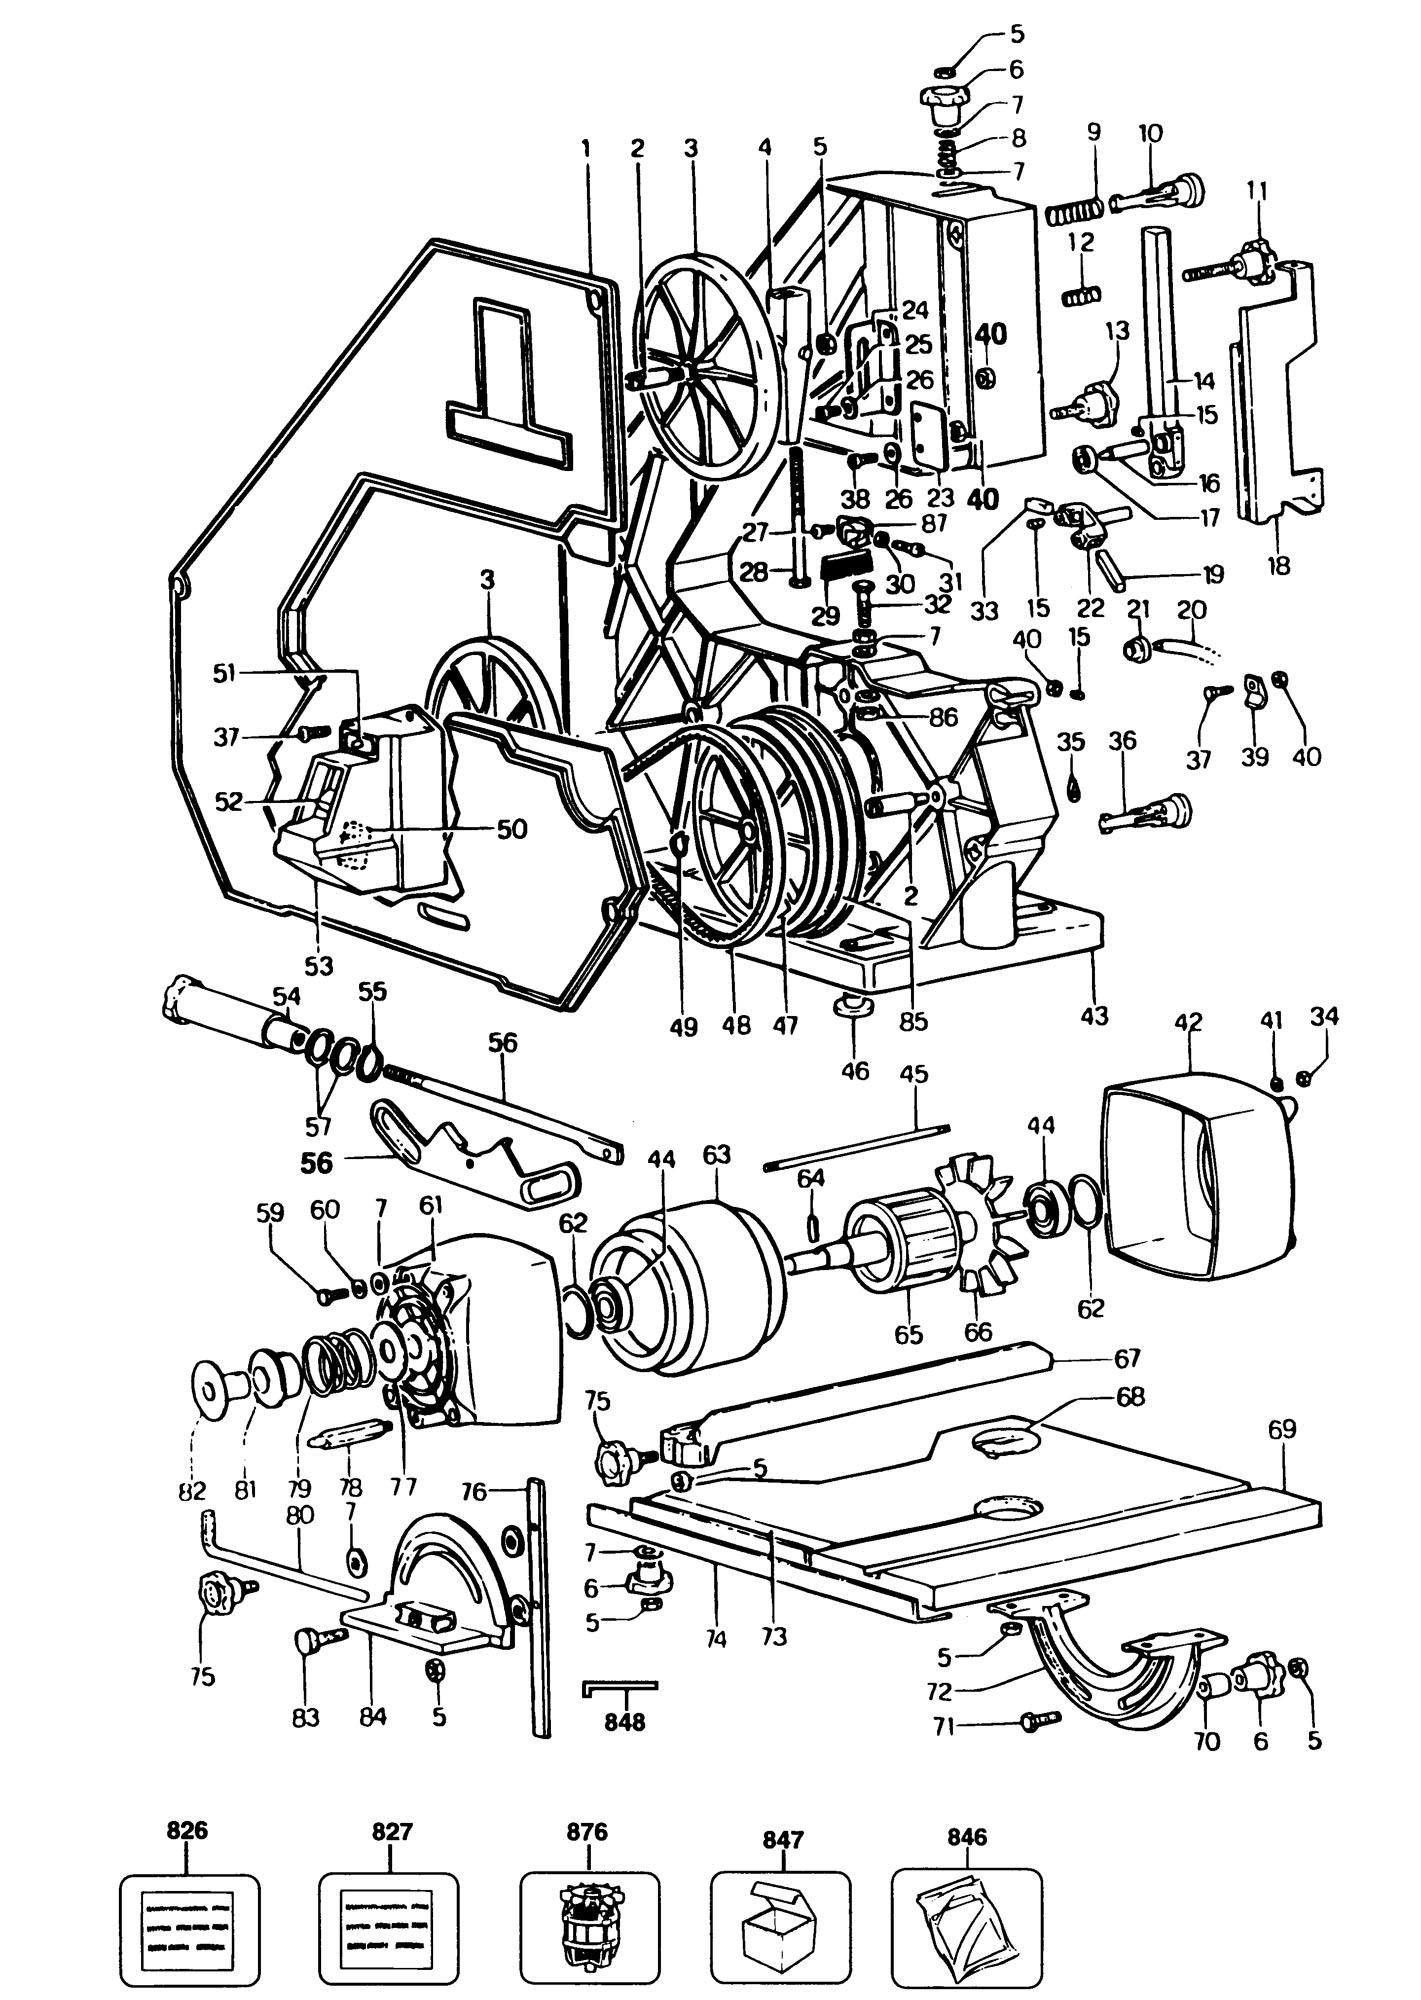 Spares For Black Amp Decker Bd339 A Bandsaw Type 1